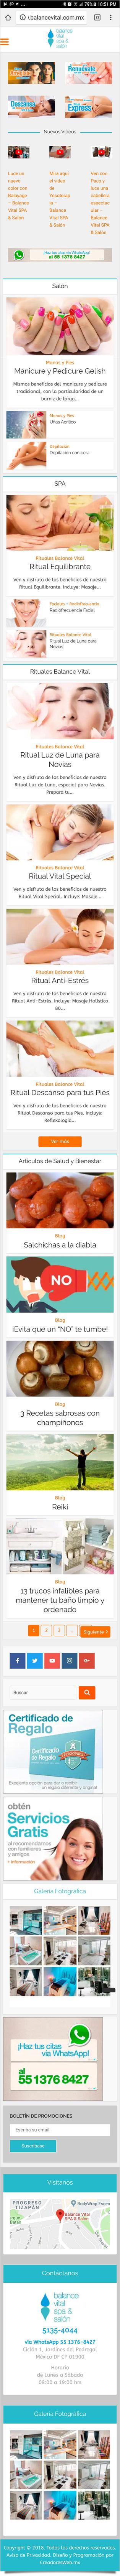 Balance Vital SPA & Salón - Diseño de Página Web - CreadoresWeb.mx